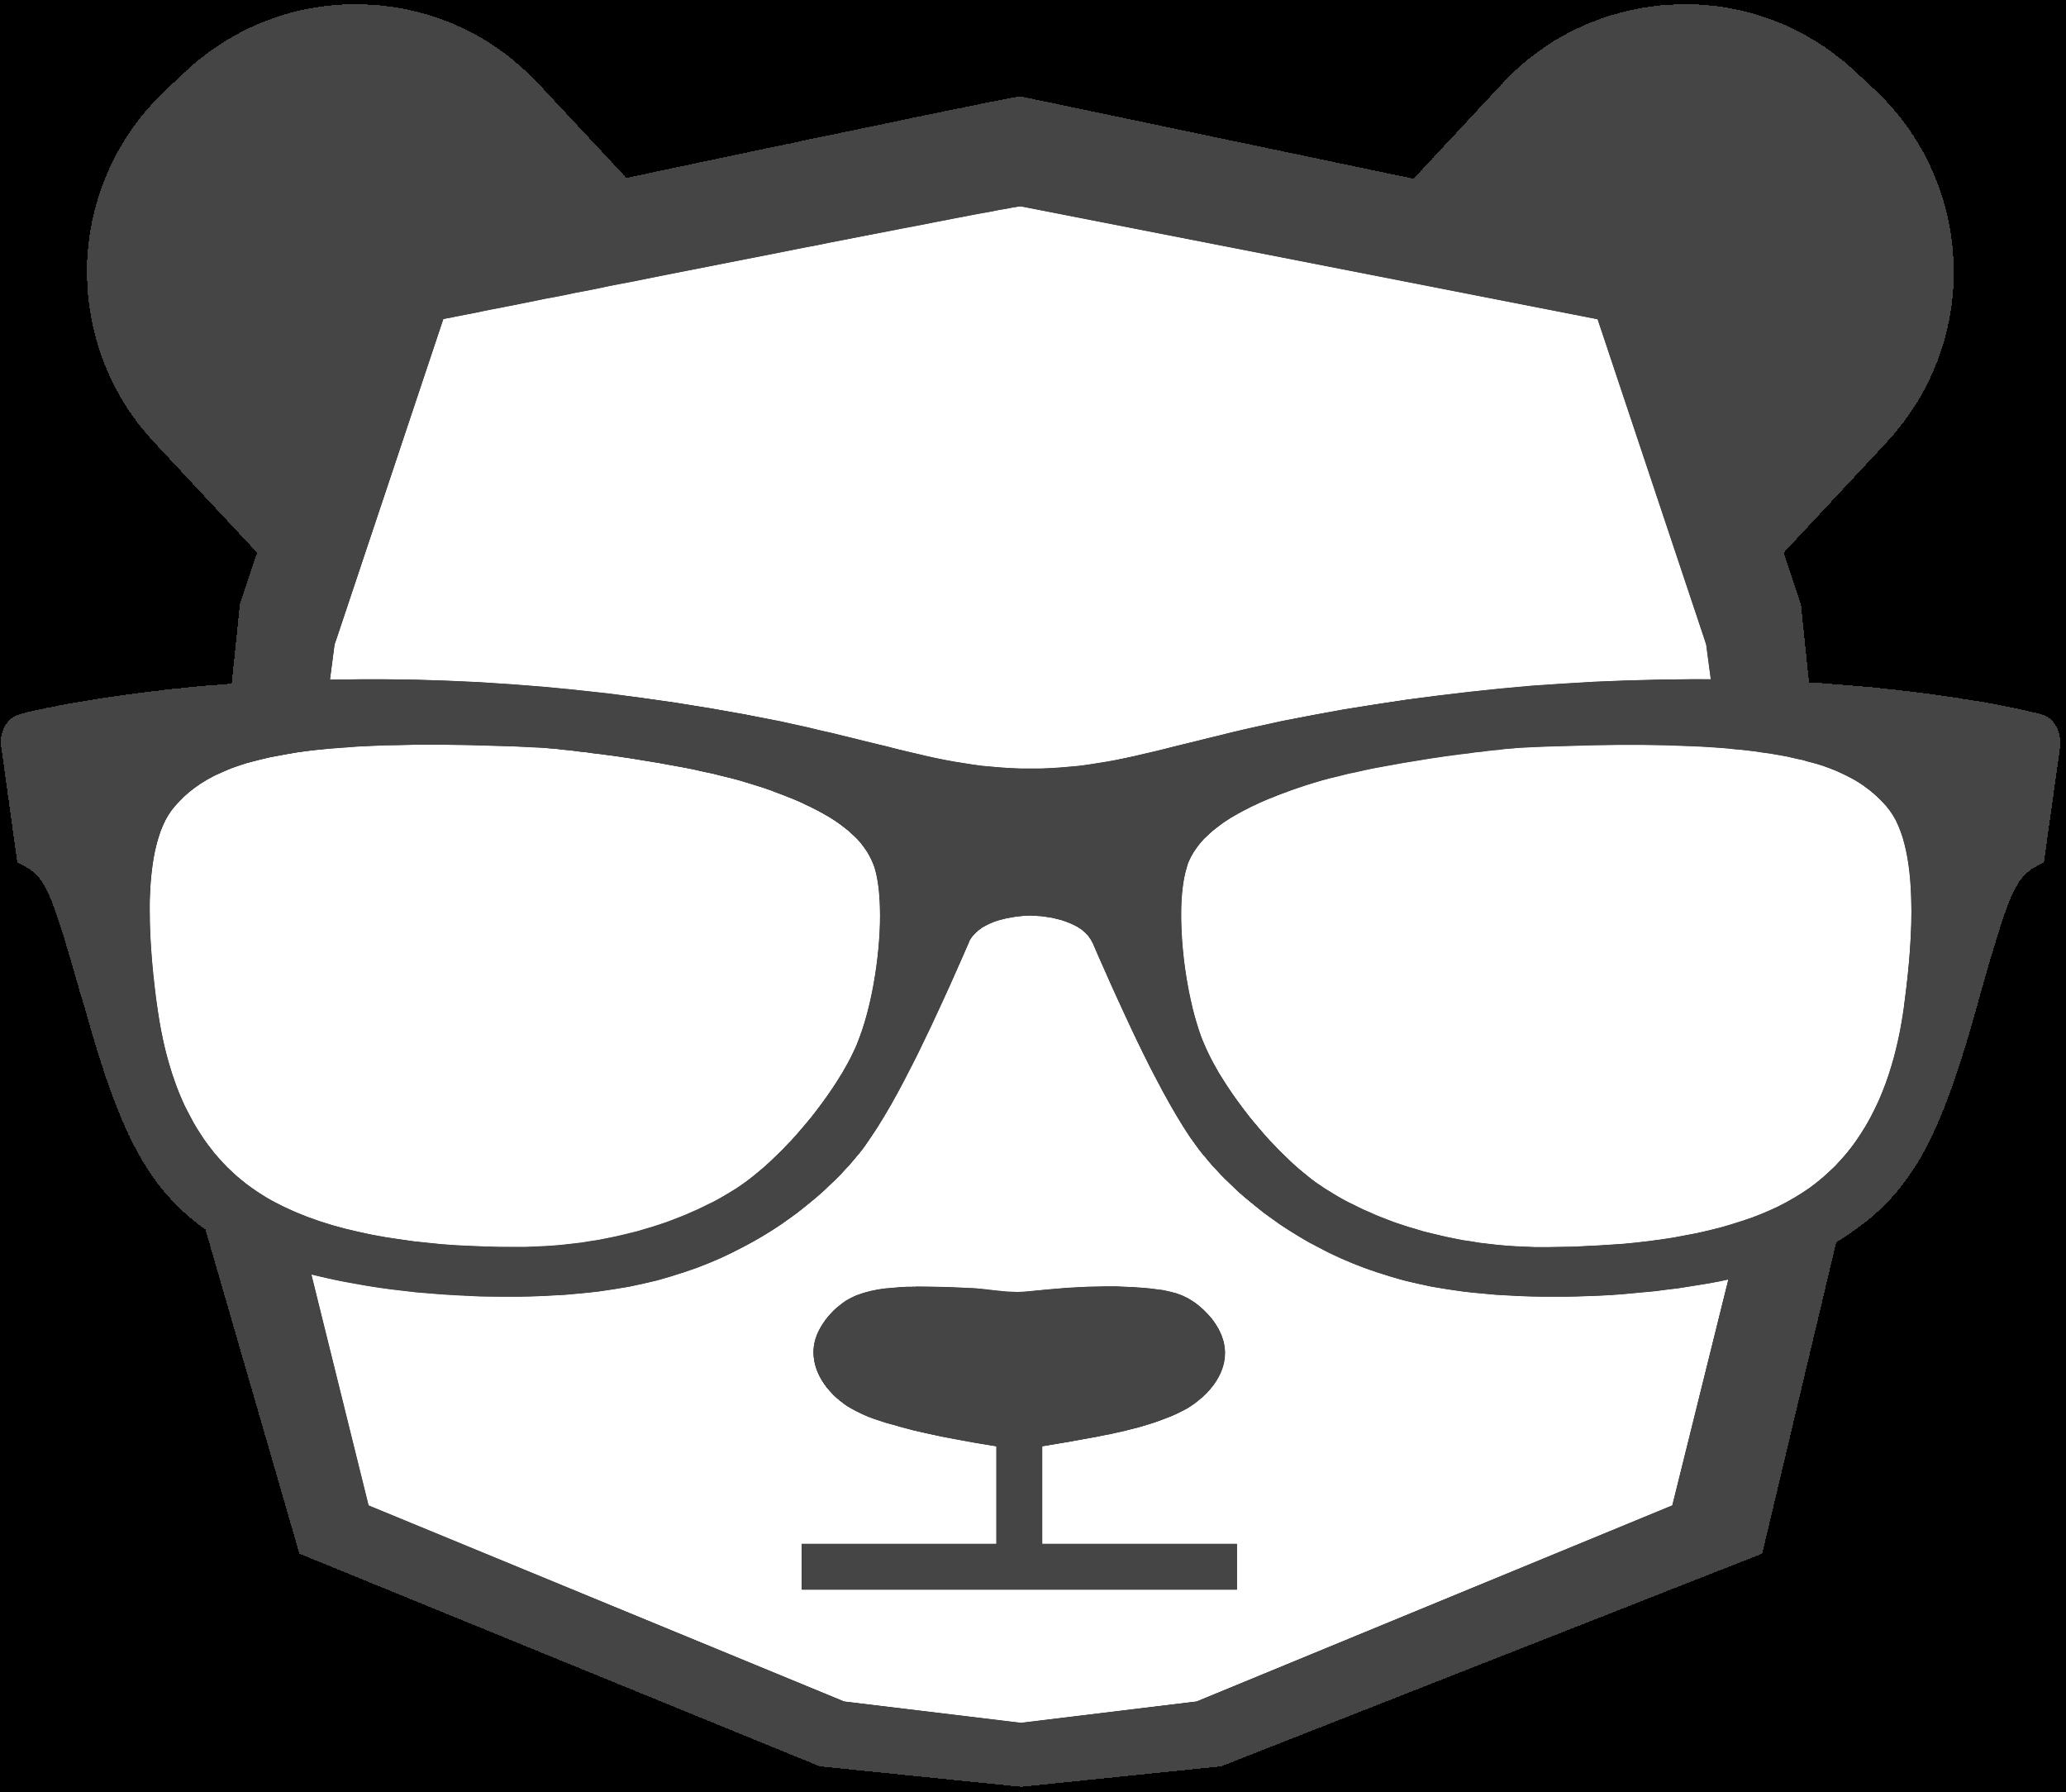 Логотип Big Panda